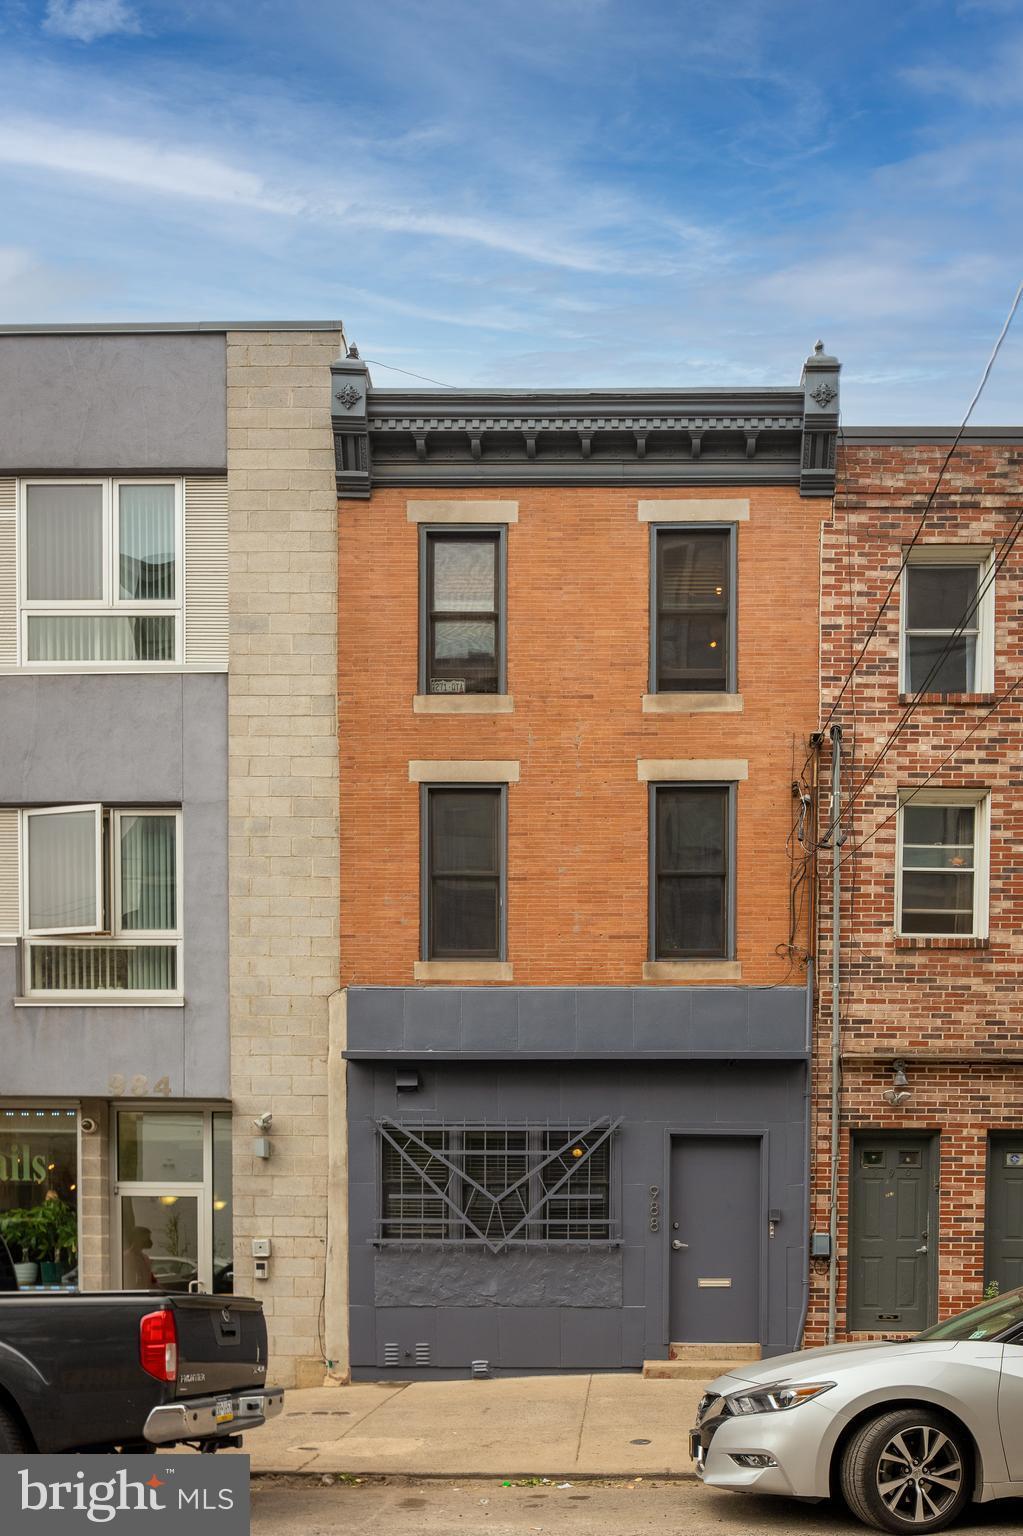 988 N 2nd St, Philadelphia, PA, 19123